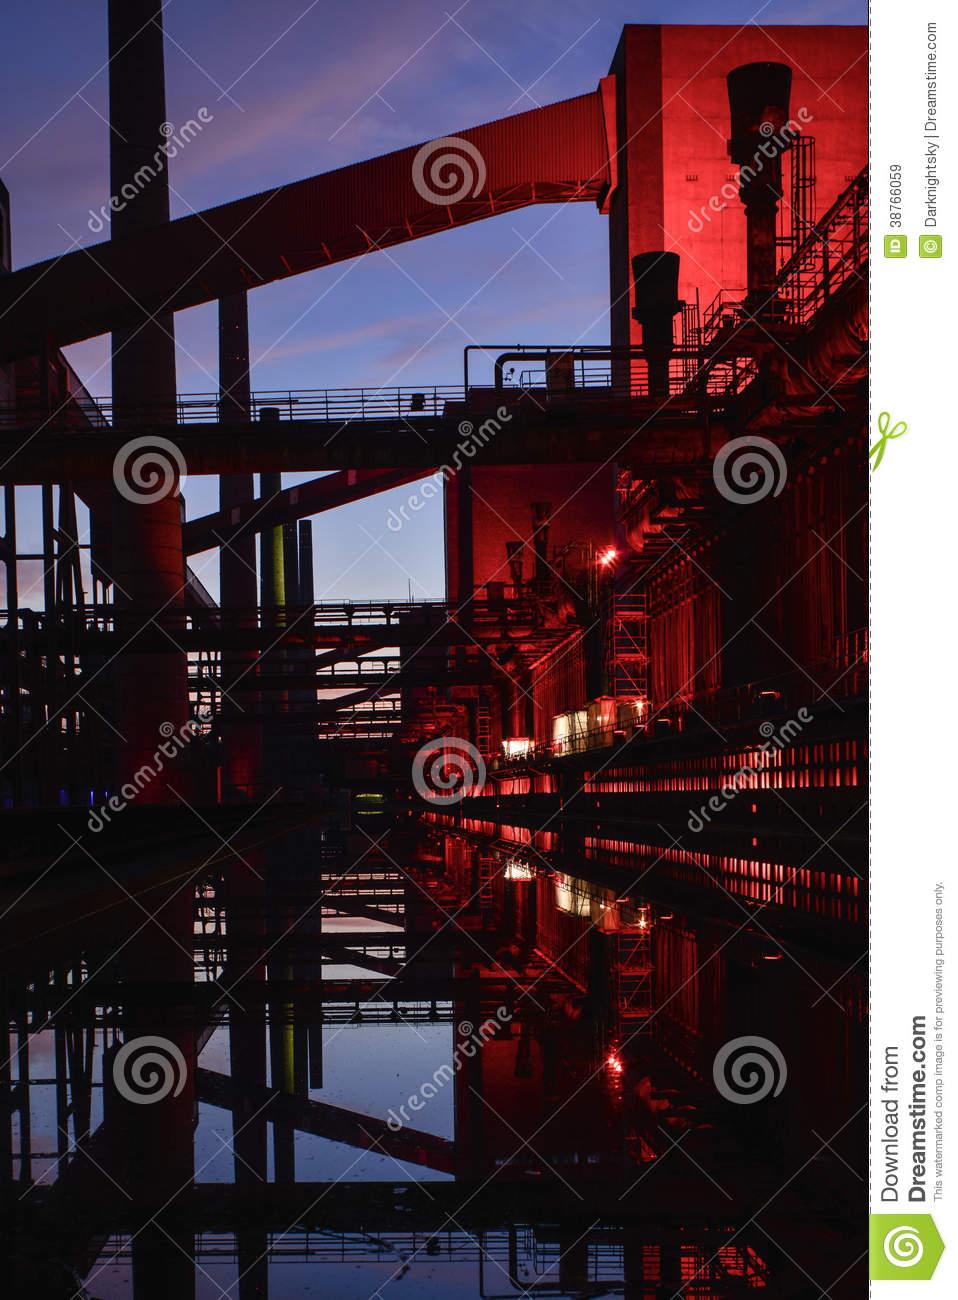 Zeche Zollverein Royalty Free Stock Images.